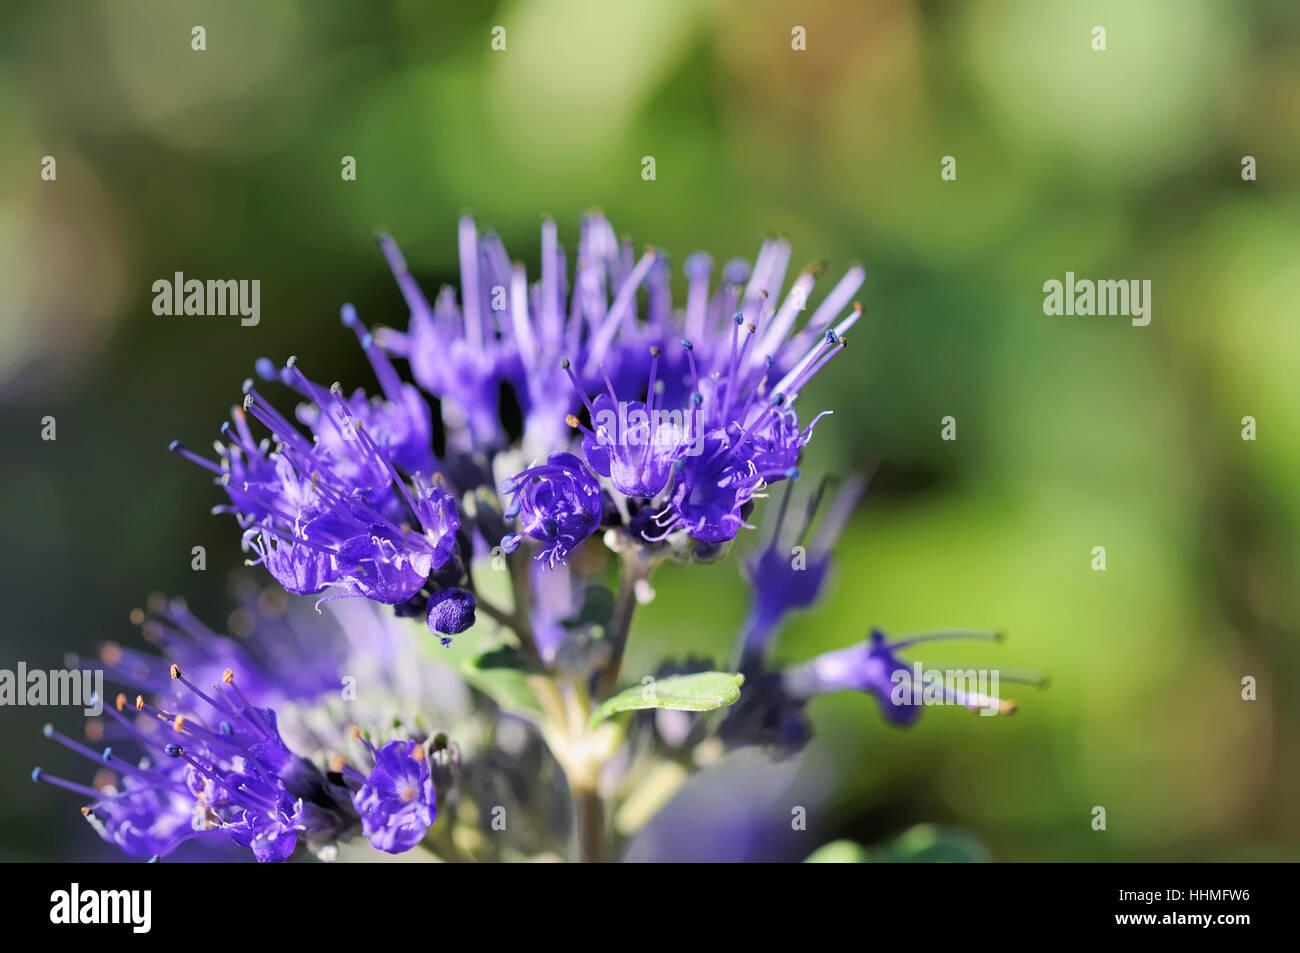 Blue Flower Plant Bloom Blossom Flourish Flourishing Flowers